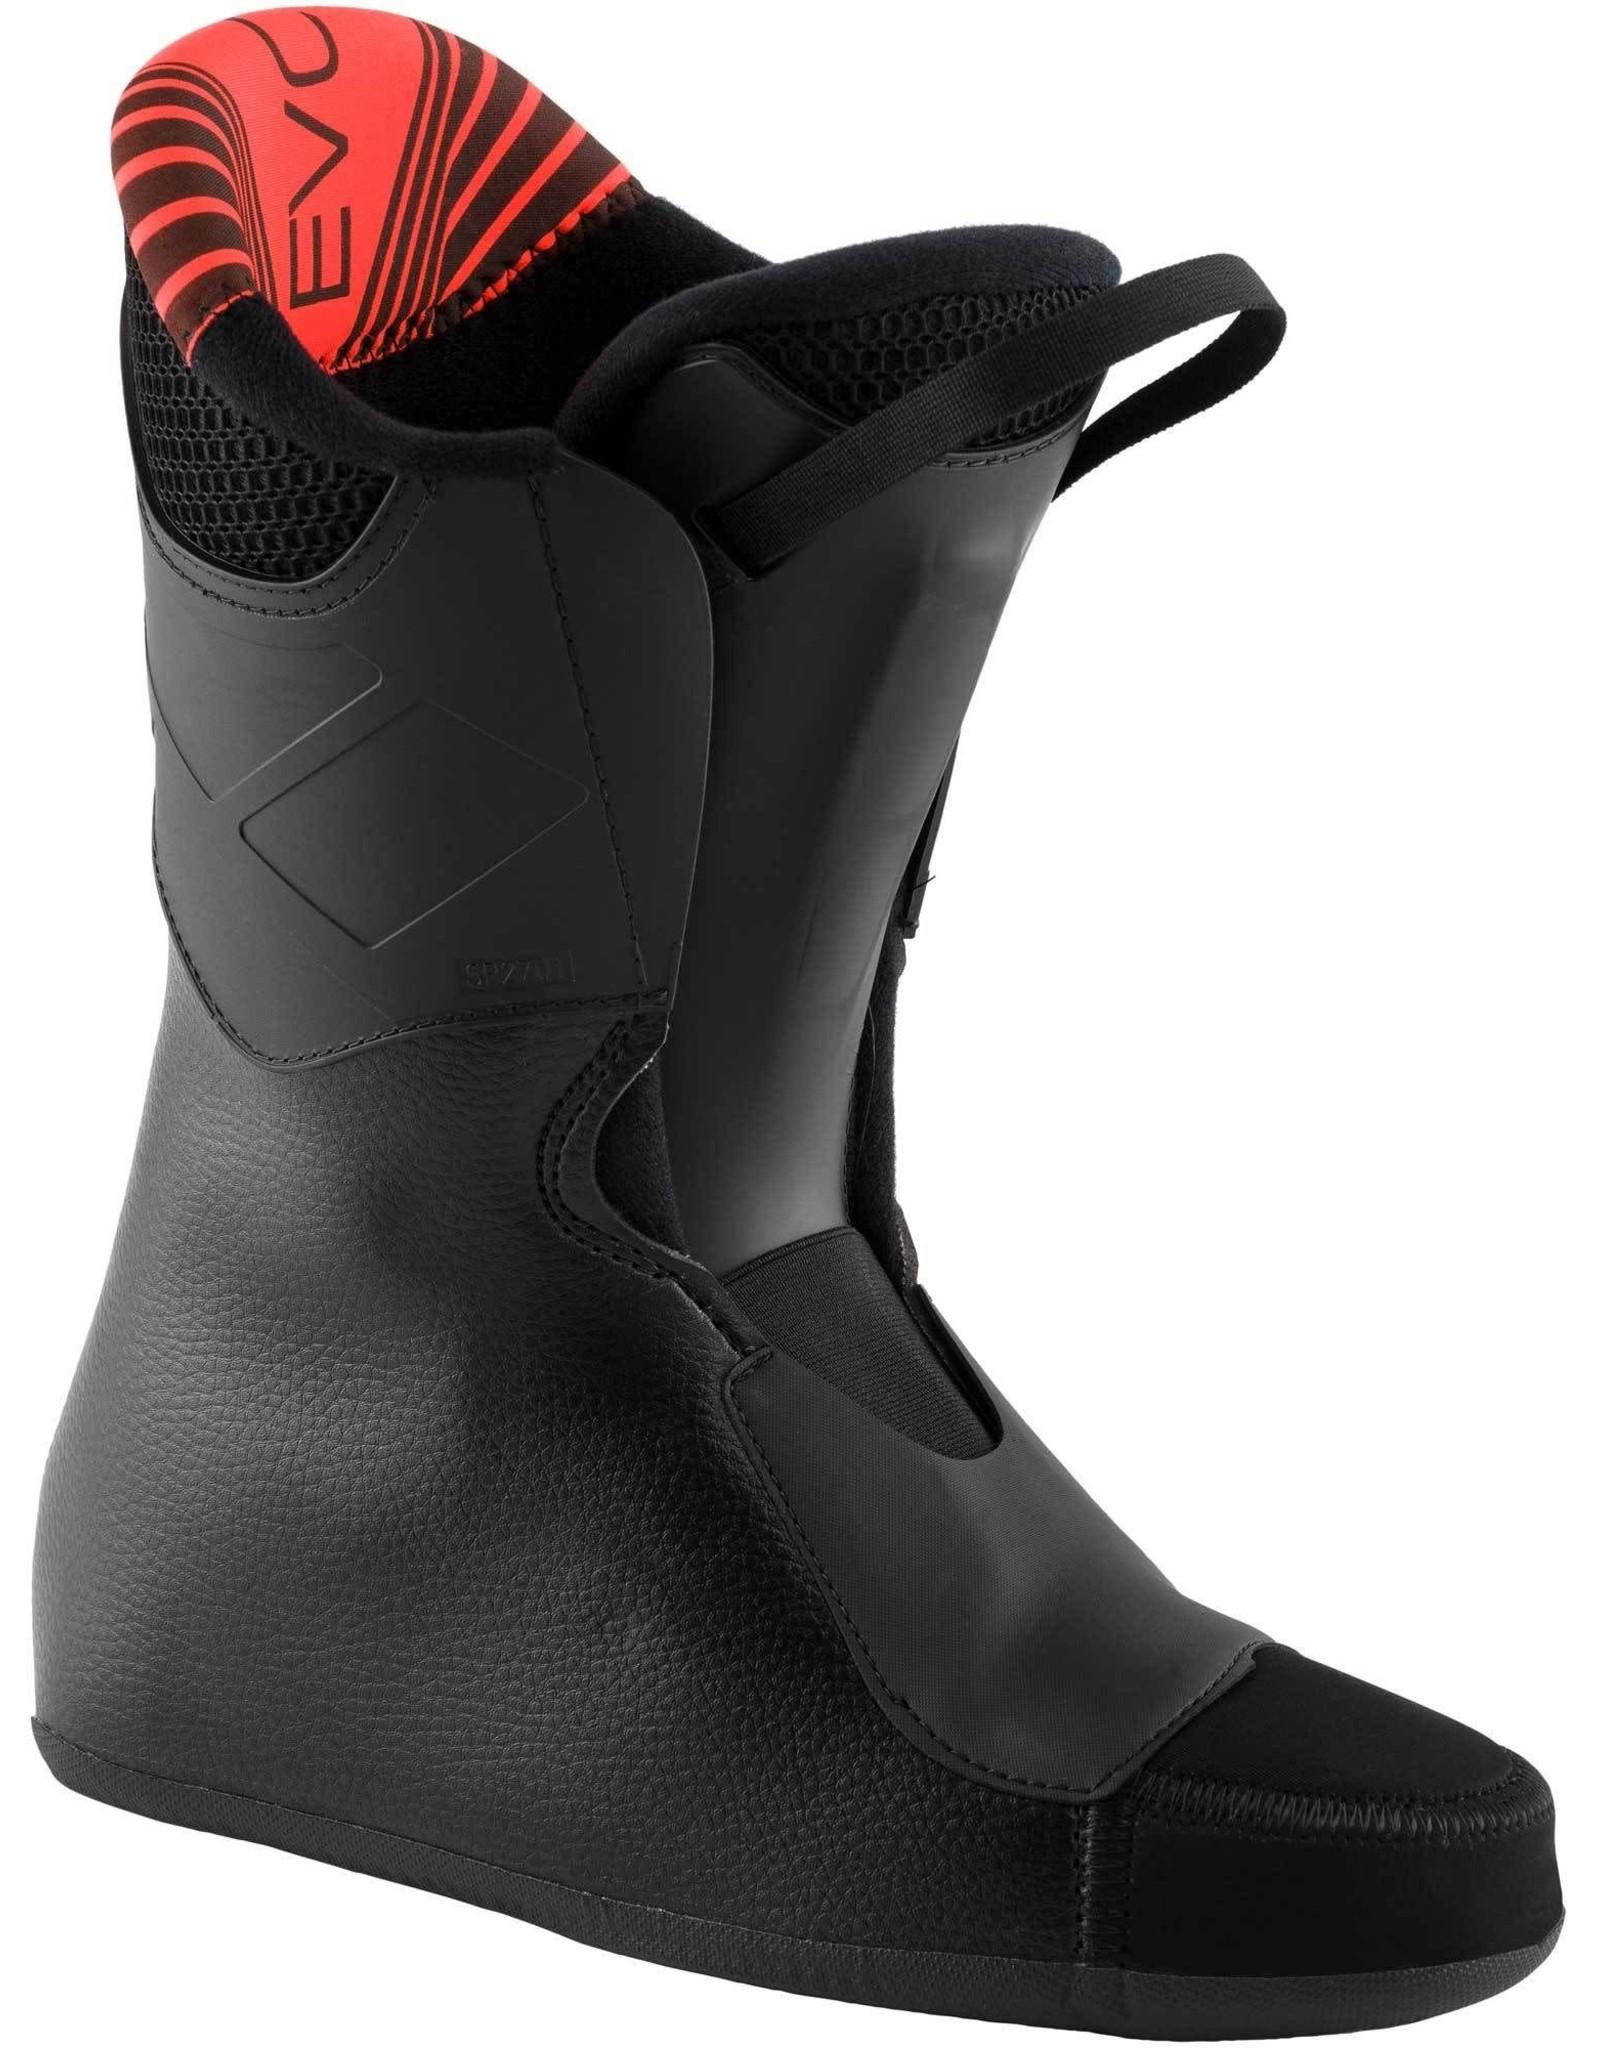 ROSSIGNOL Rossignol EVO 70 men alpine ski boot blk-red 22